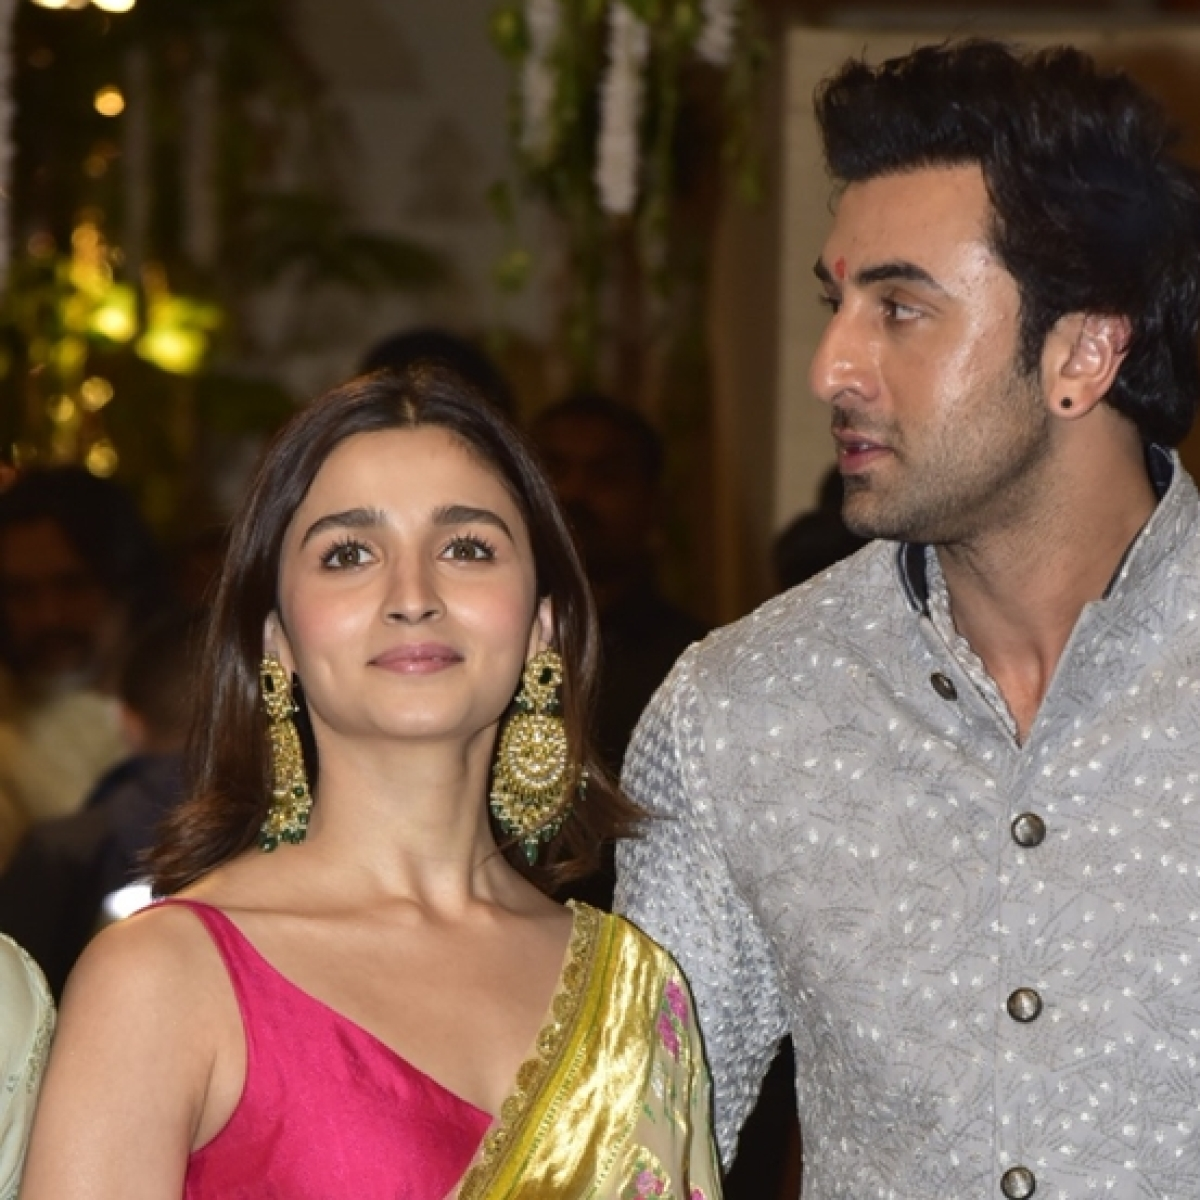 Menace of misunderstandings: Alia's horoscope is delaying her wedding with Ranbir, claims astrologer